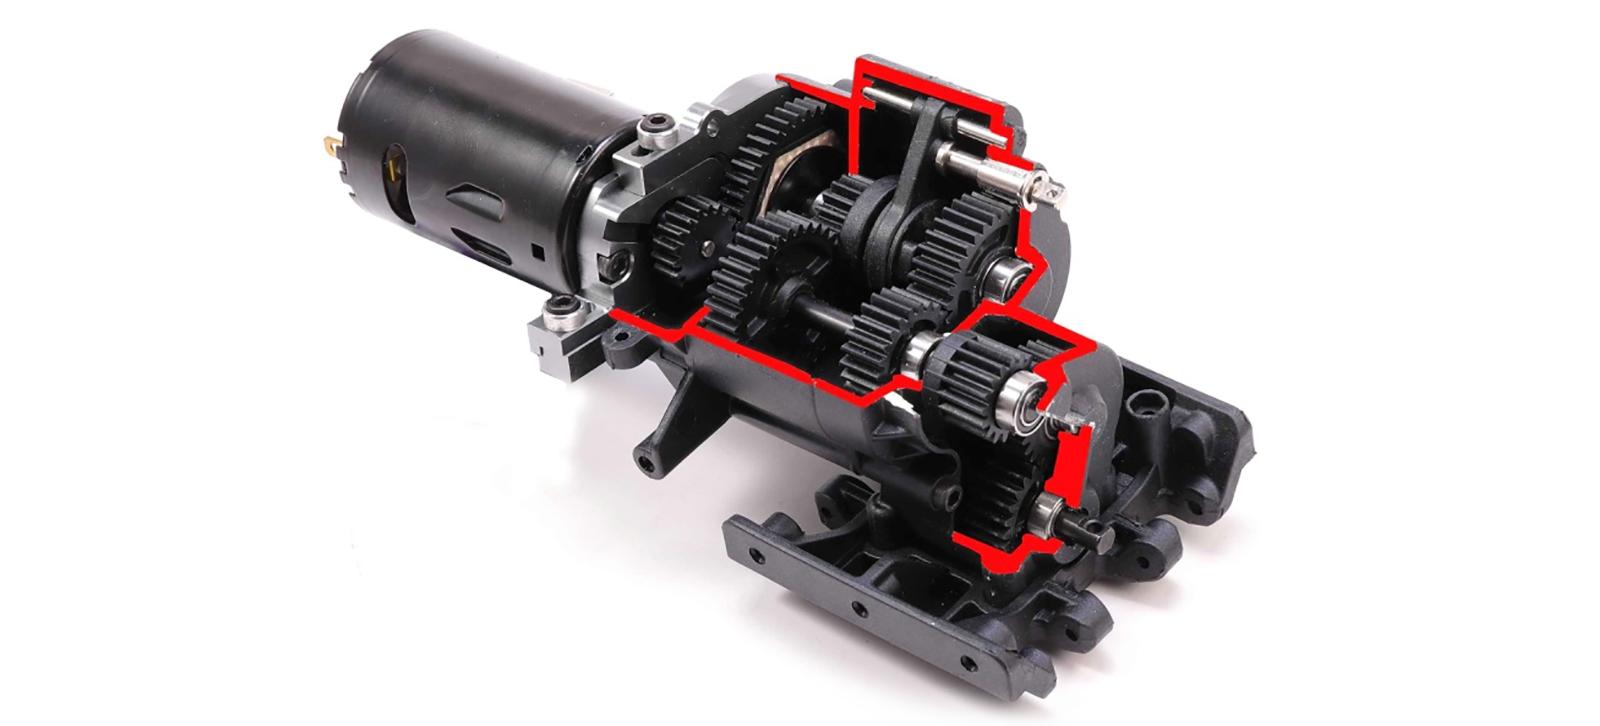 AMXRock RCX8 Getriebe